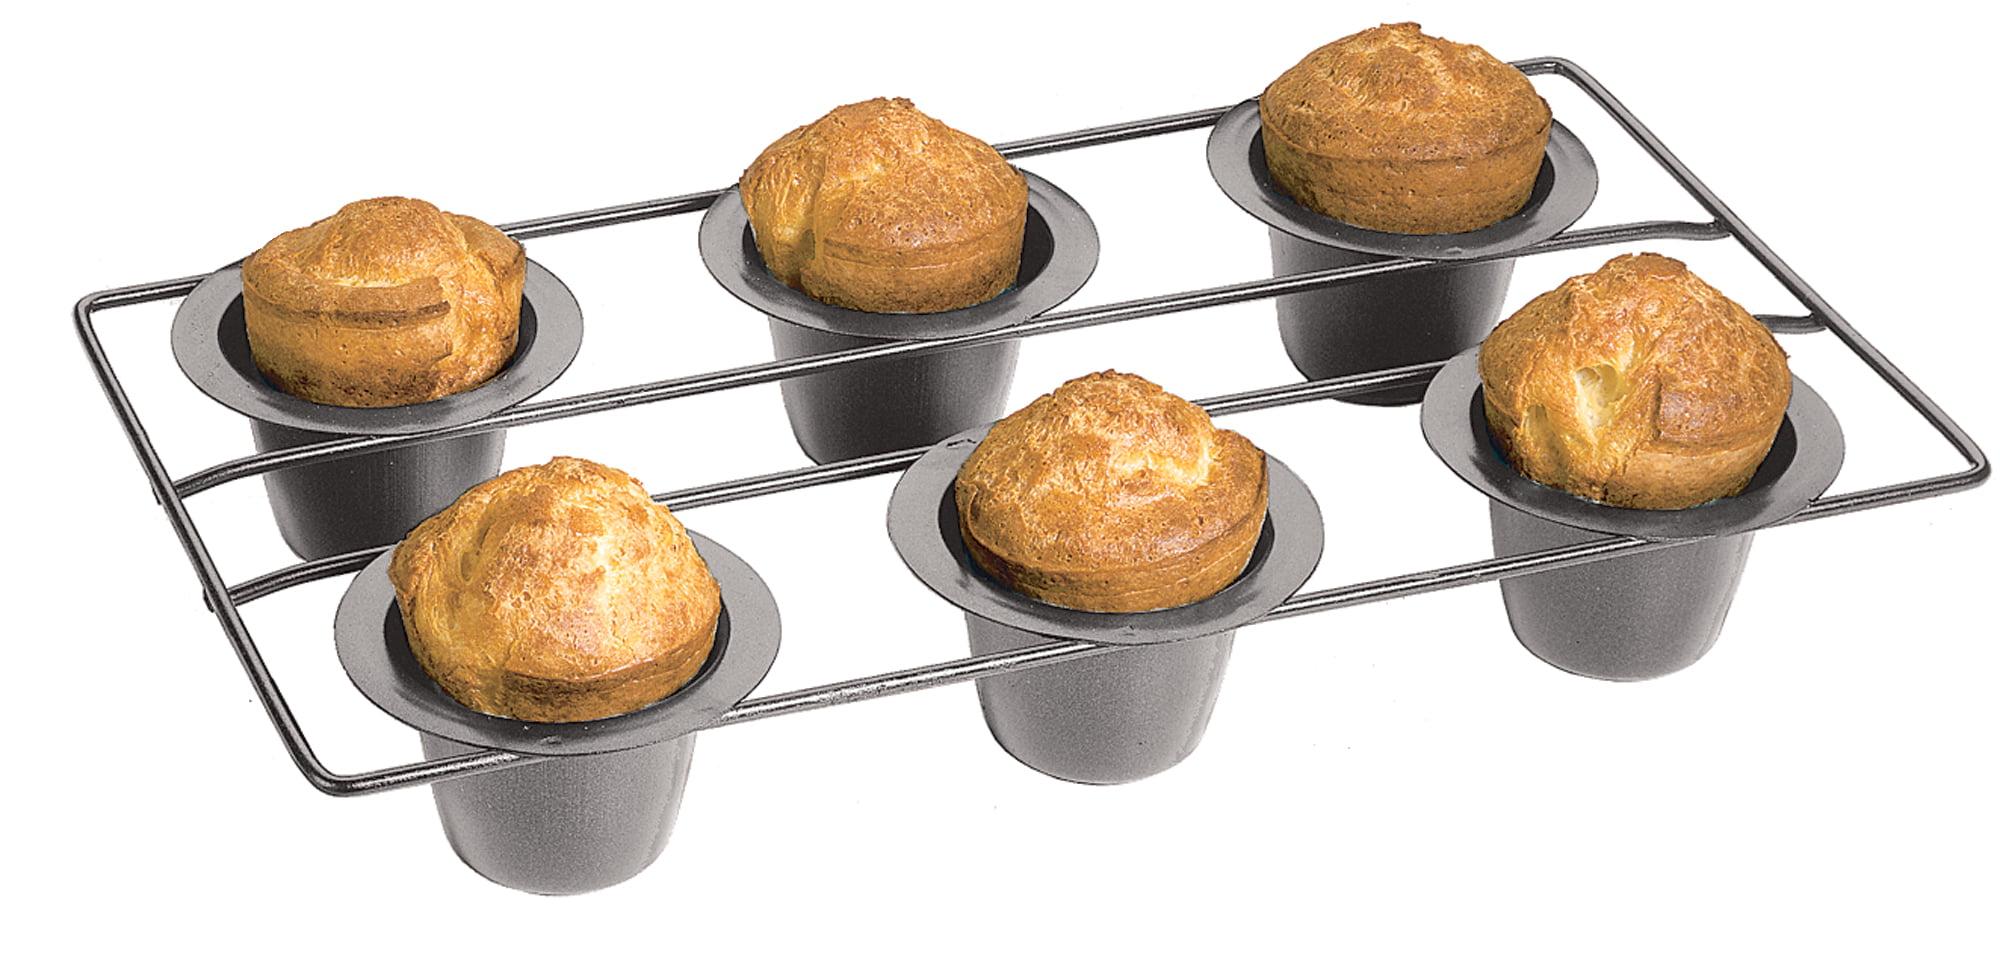 Fox Run Nonstick 6 Cup Linking Popover Muffin Pan Baking Bakeware Breakfast New